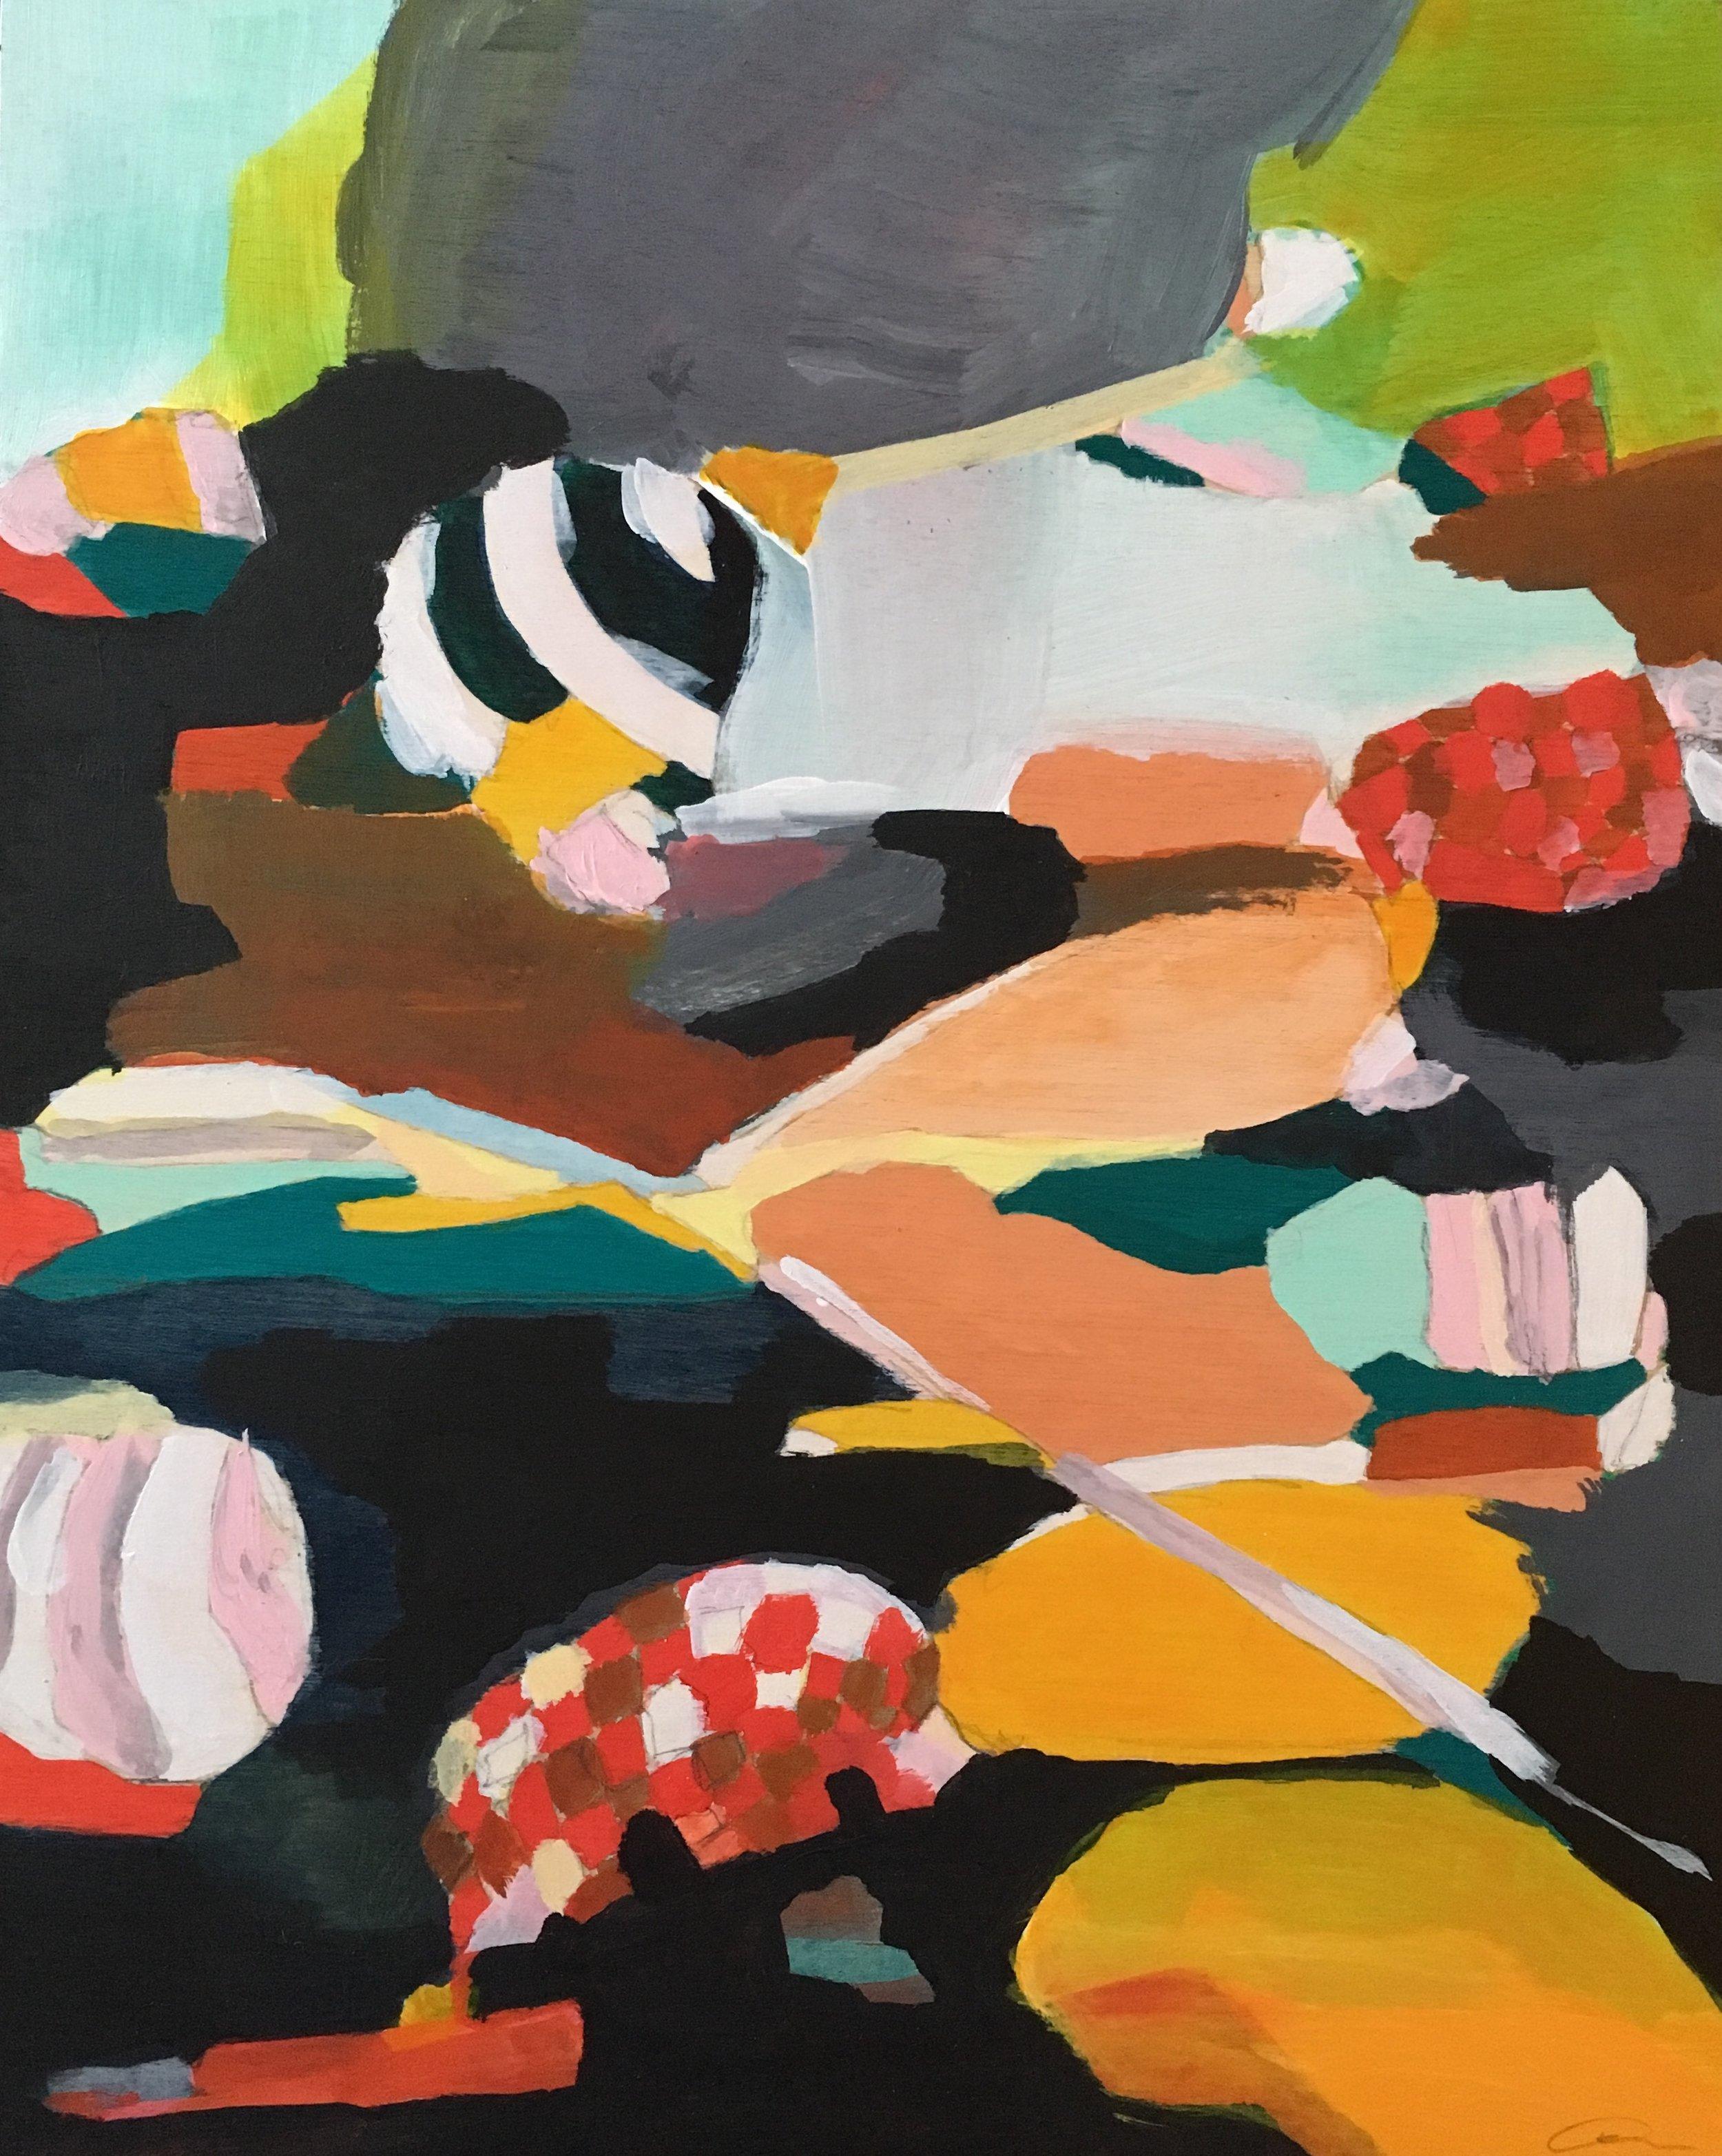 "Golden Road   10"" x 8""  Acrylic, Ink, Graphite, on birch panel  2019"